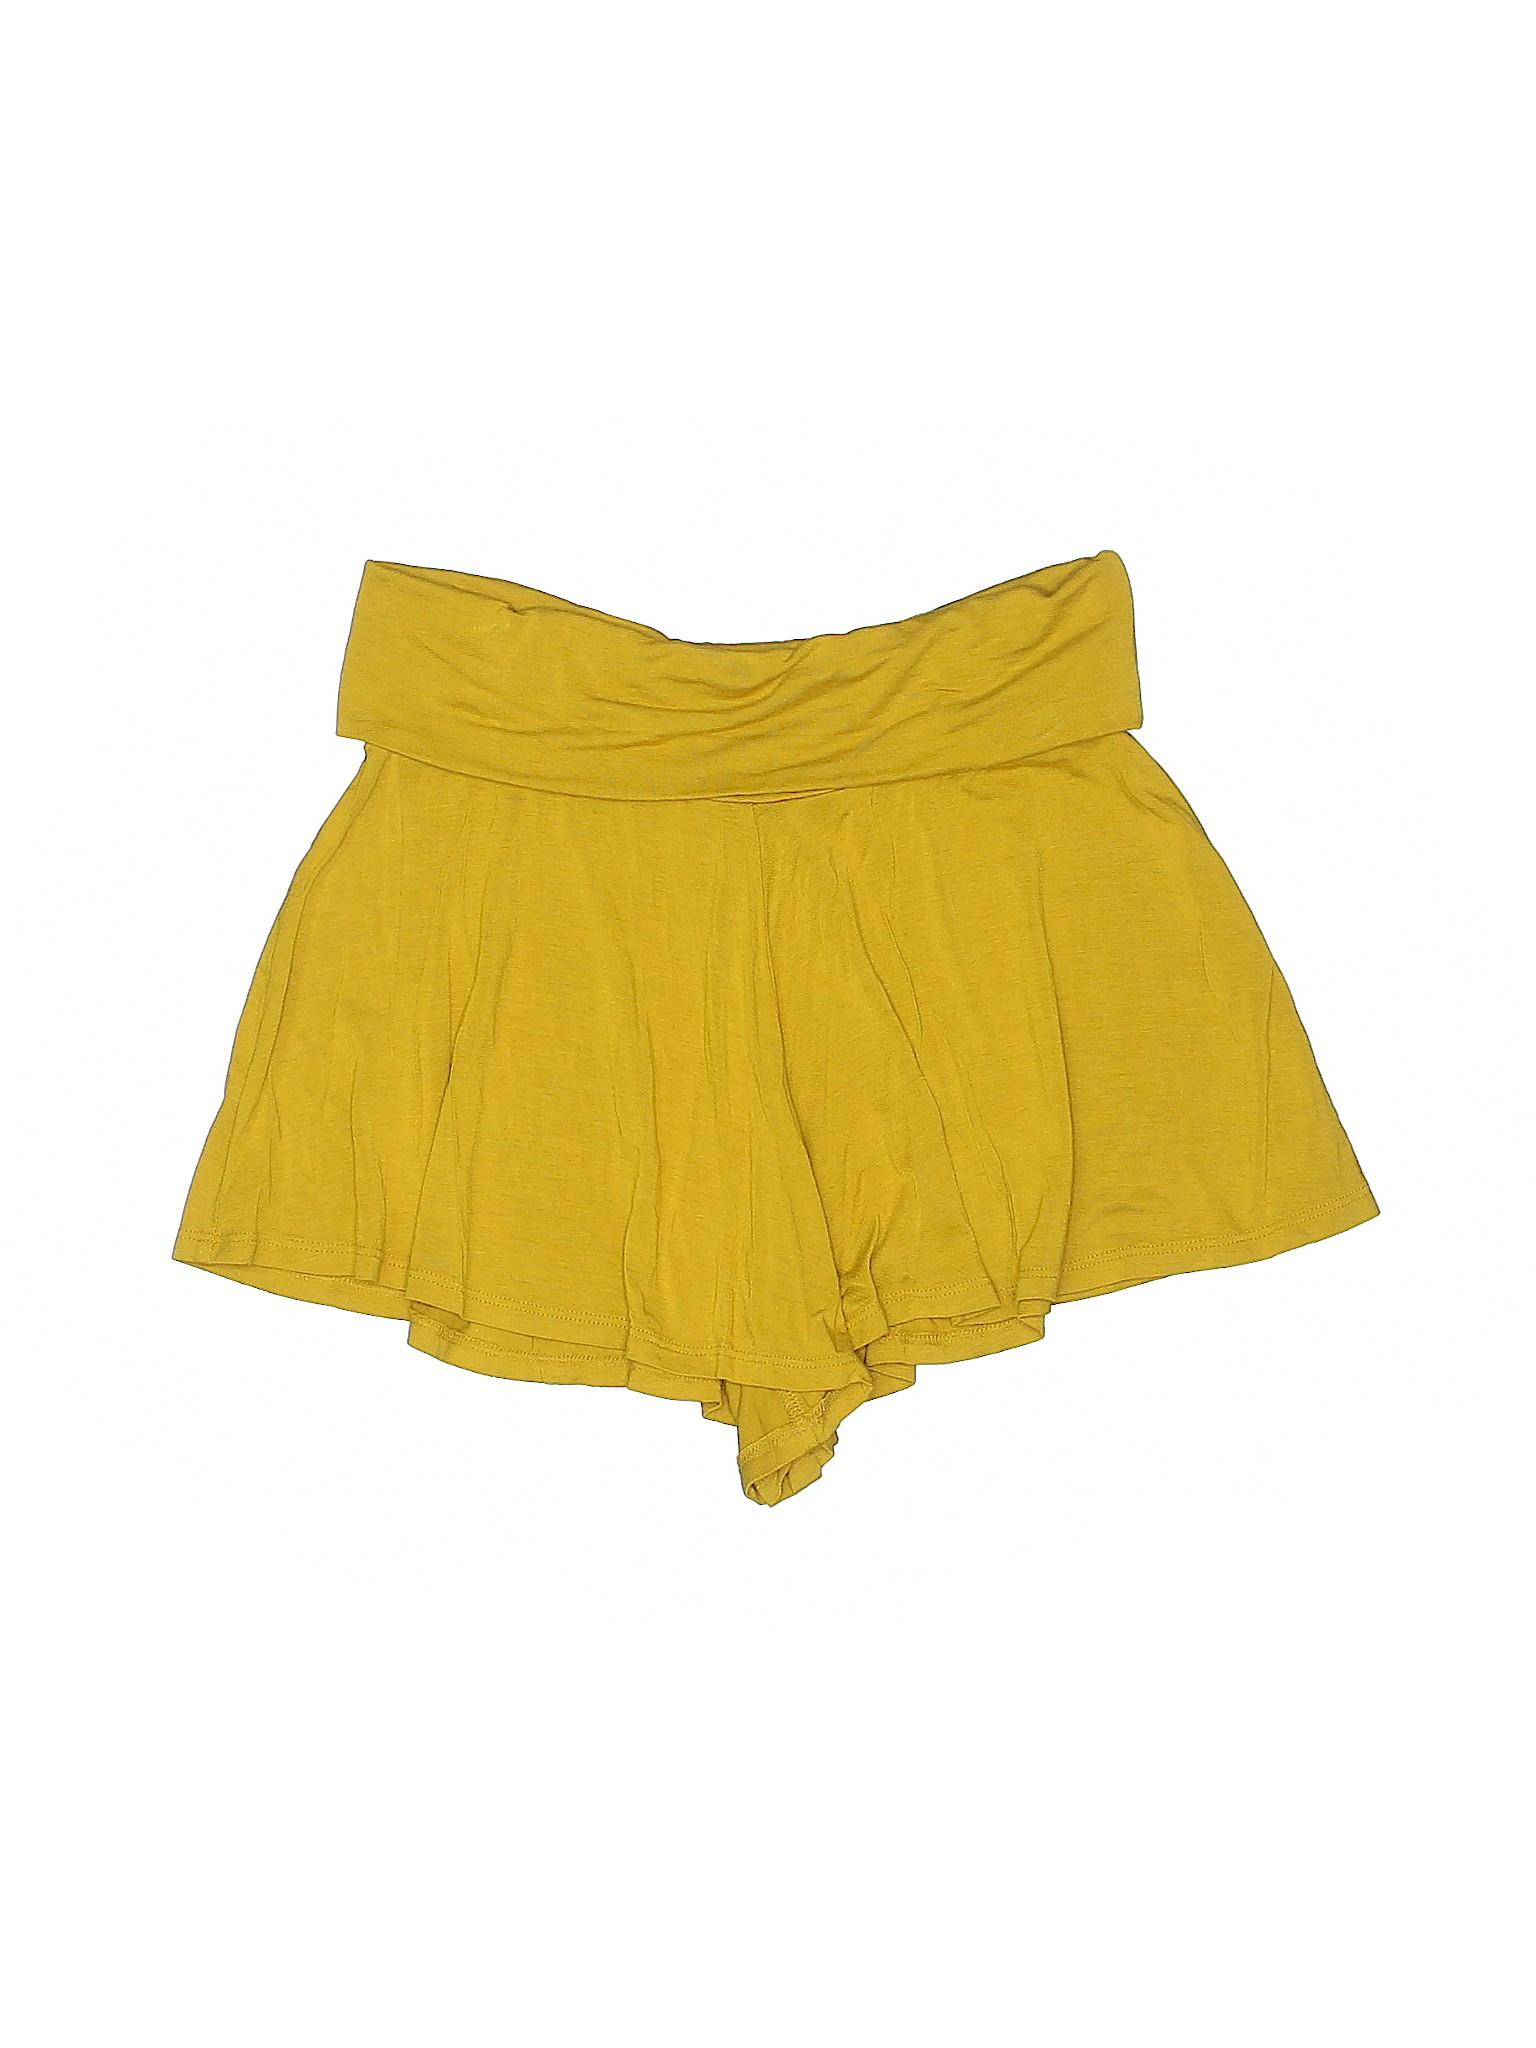 Shorts Boutique Boutique Moda Shorts International Moda Boutique International International Boutique Moda Shorts Moda wwWqz5rB1